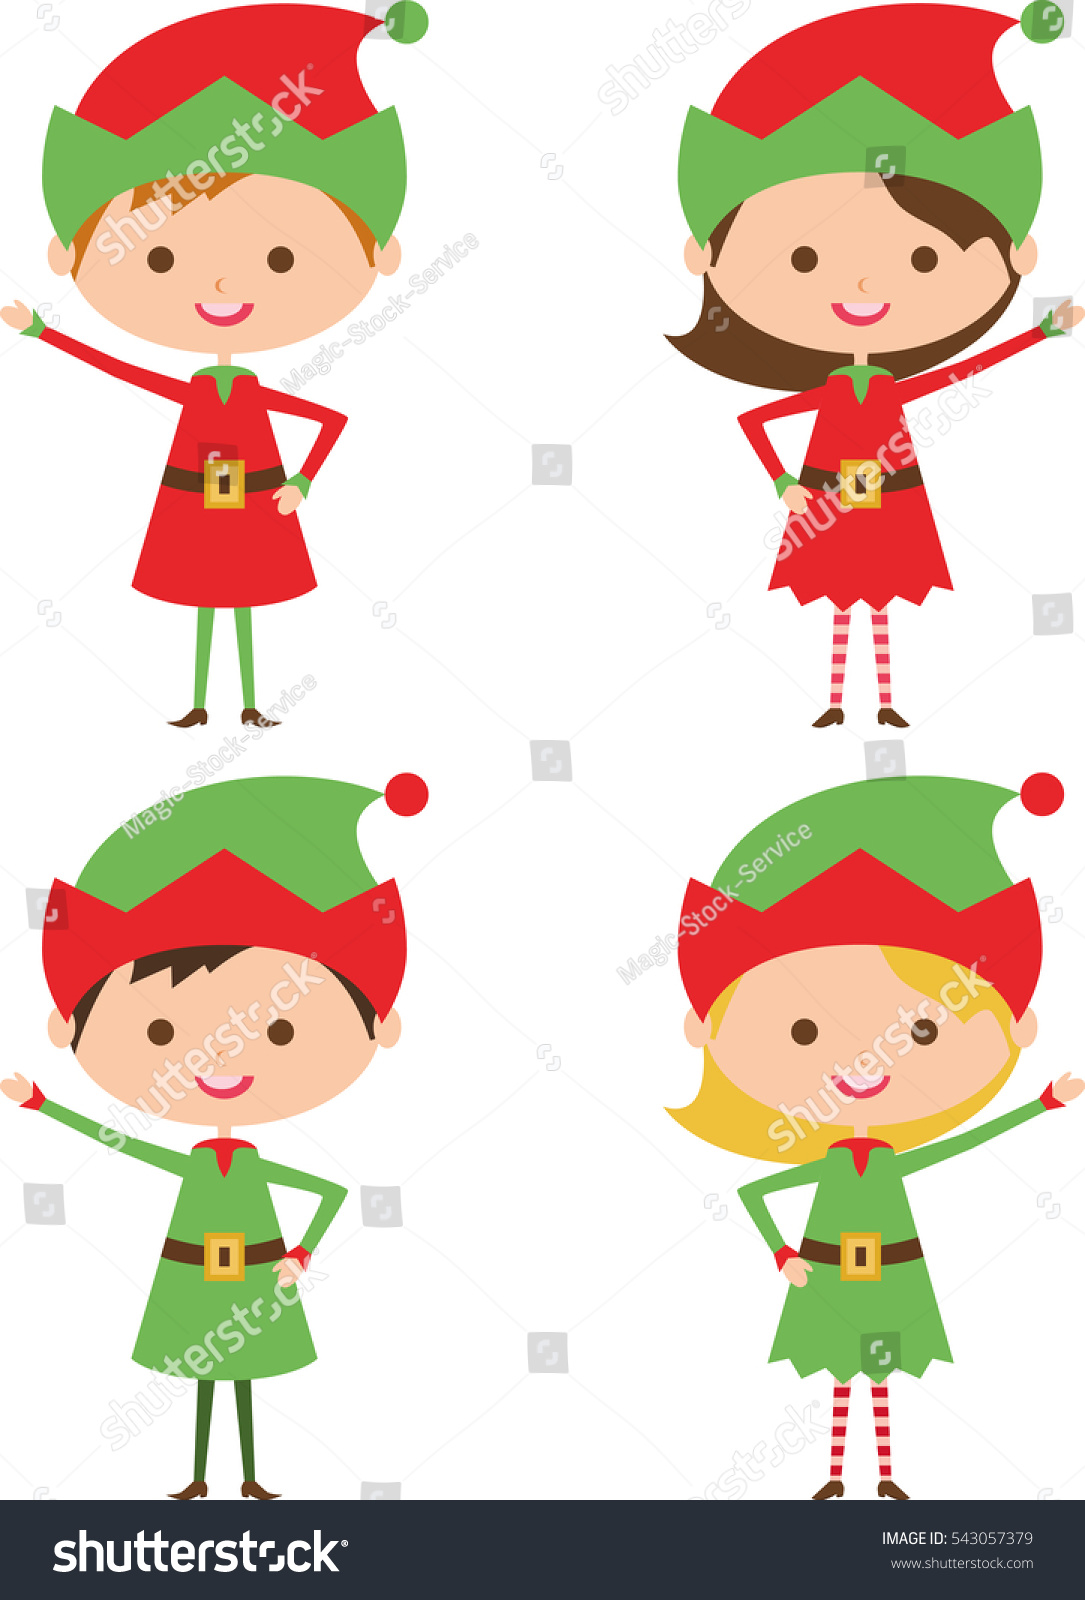 Vector Illustration Christmas Elves Gnomes Cartoon Stock Vector ...